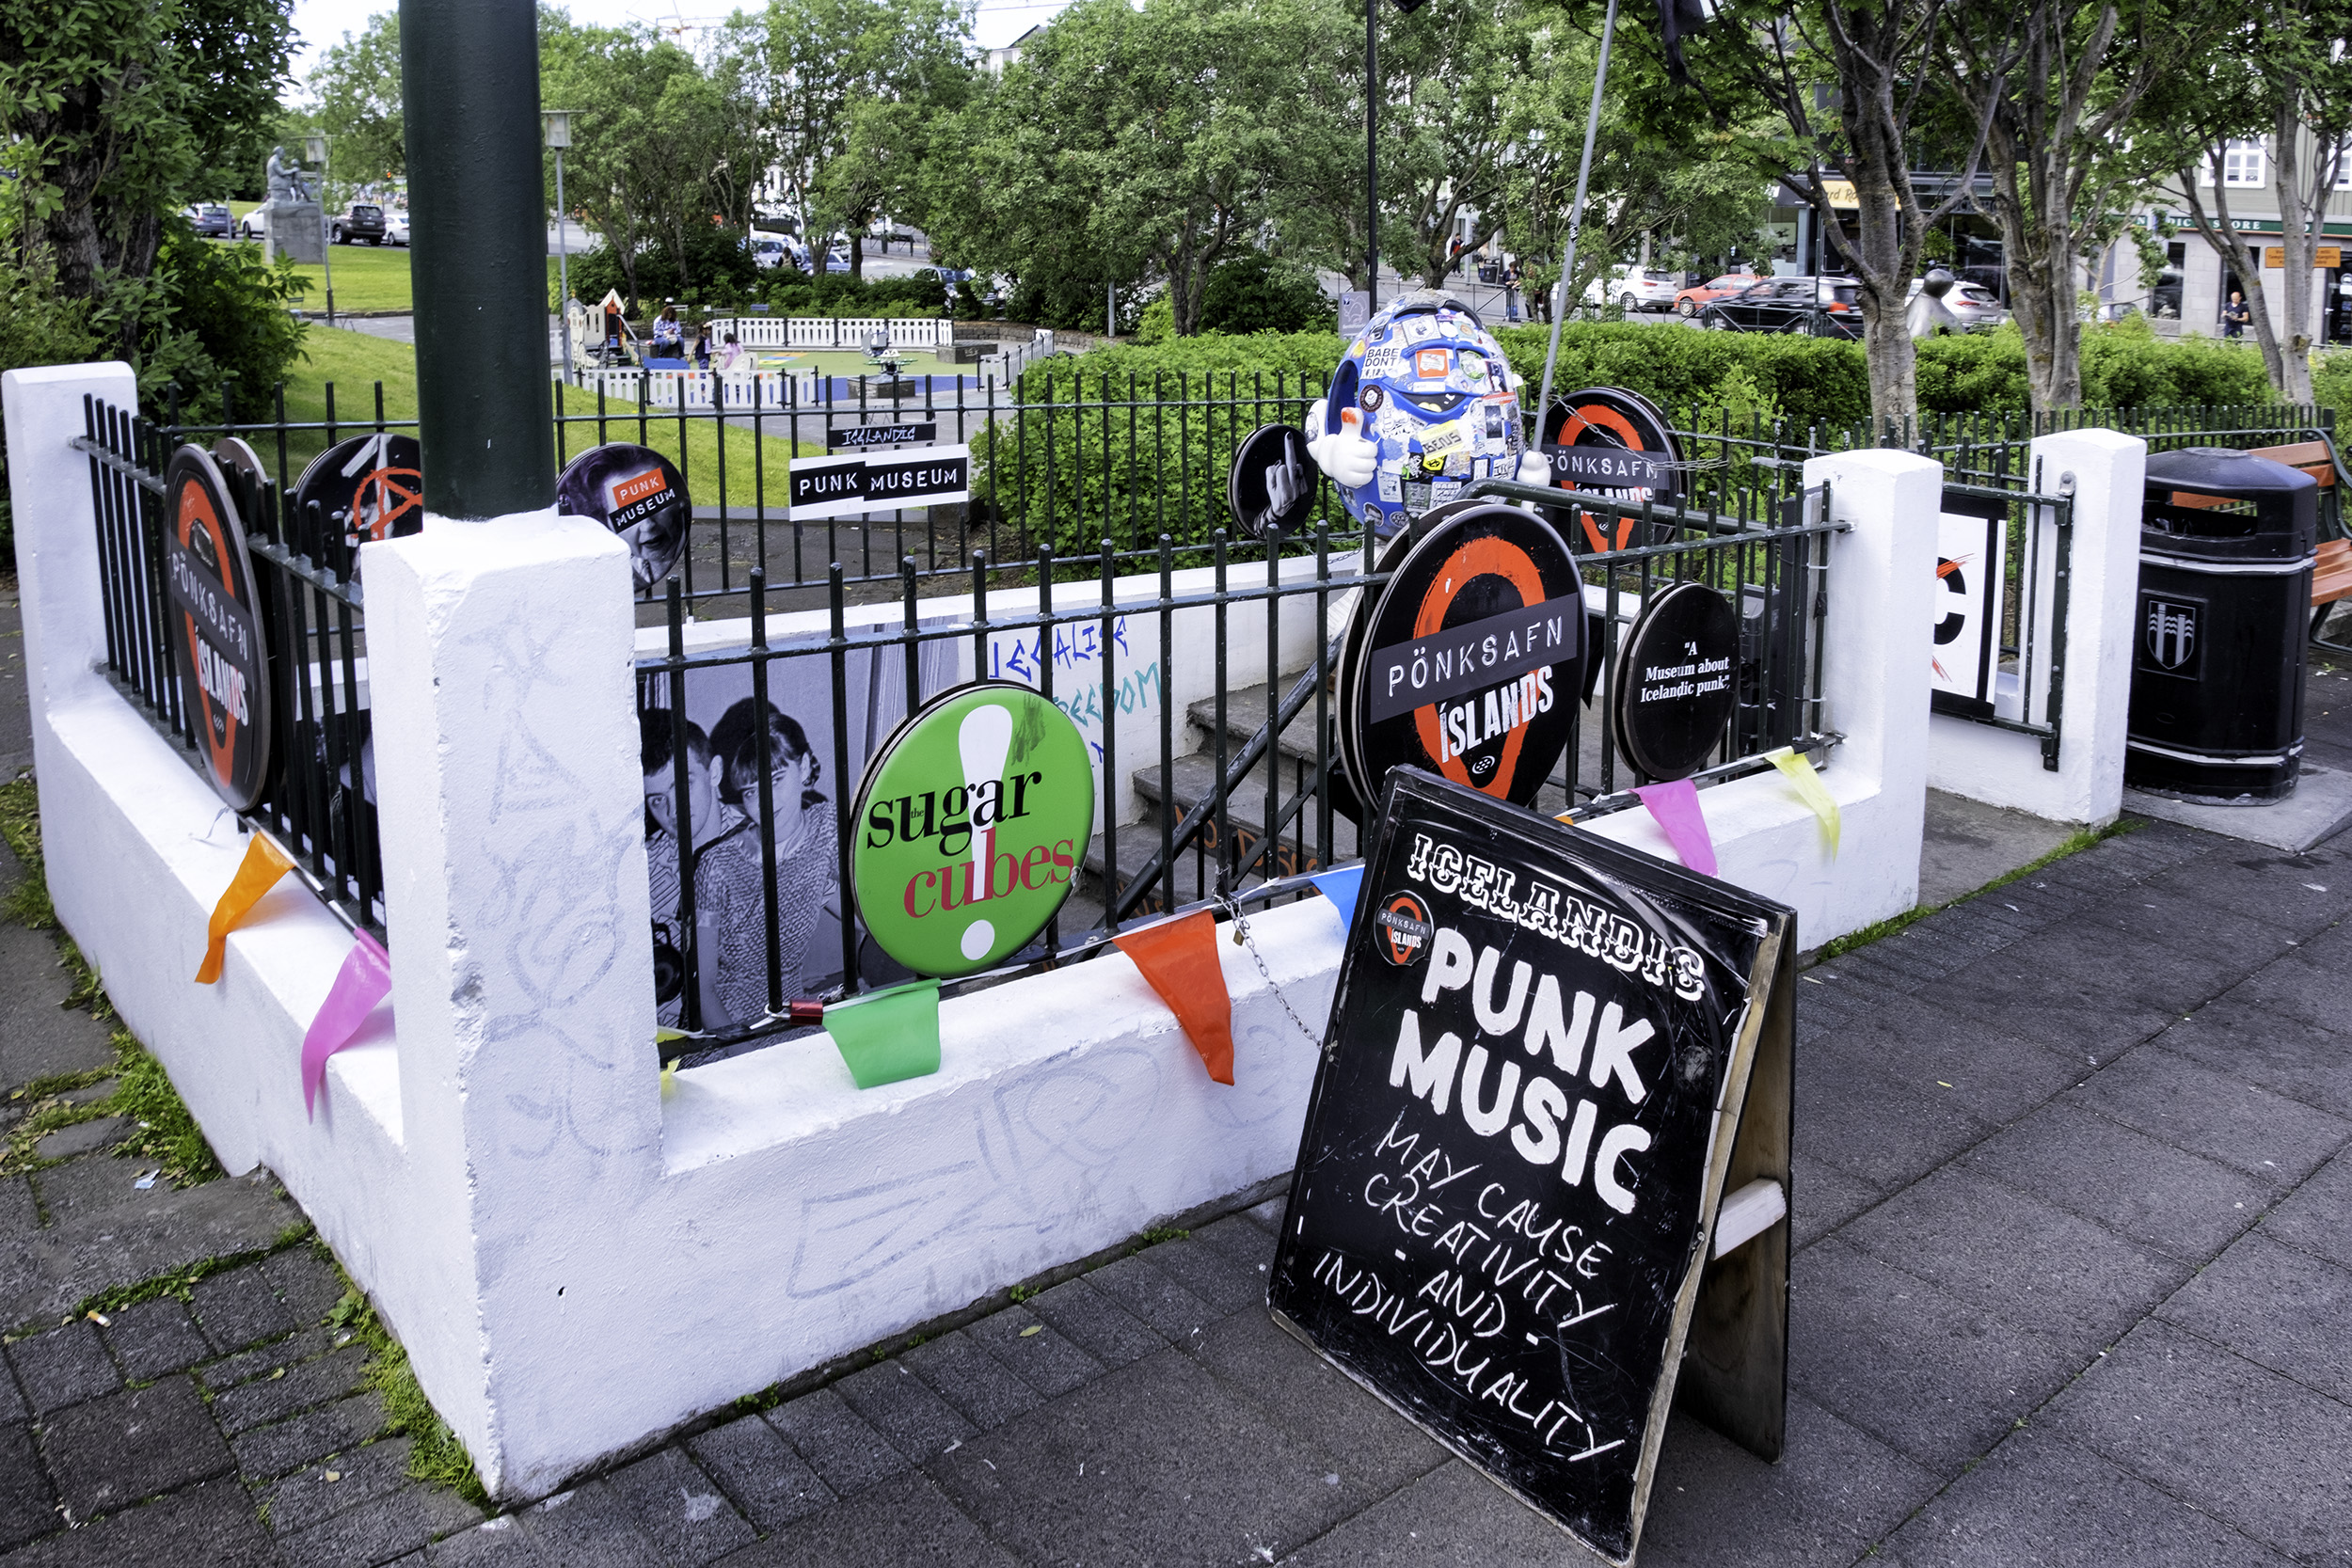 The Reykjavik Punk Museum